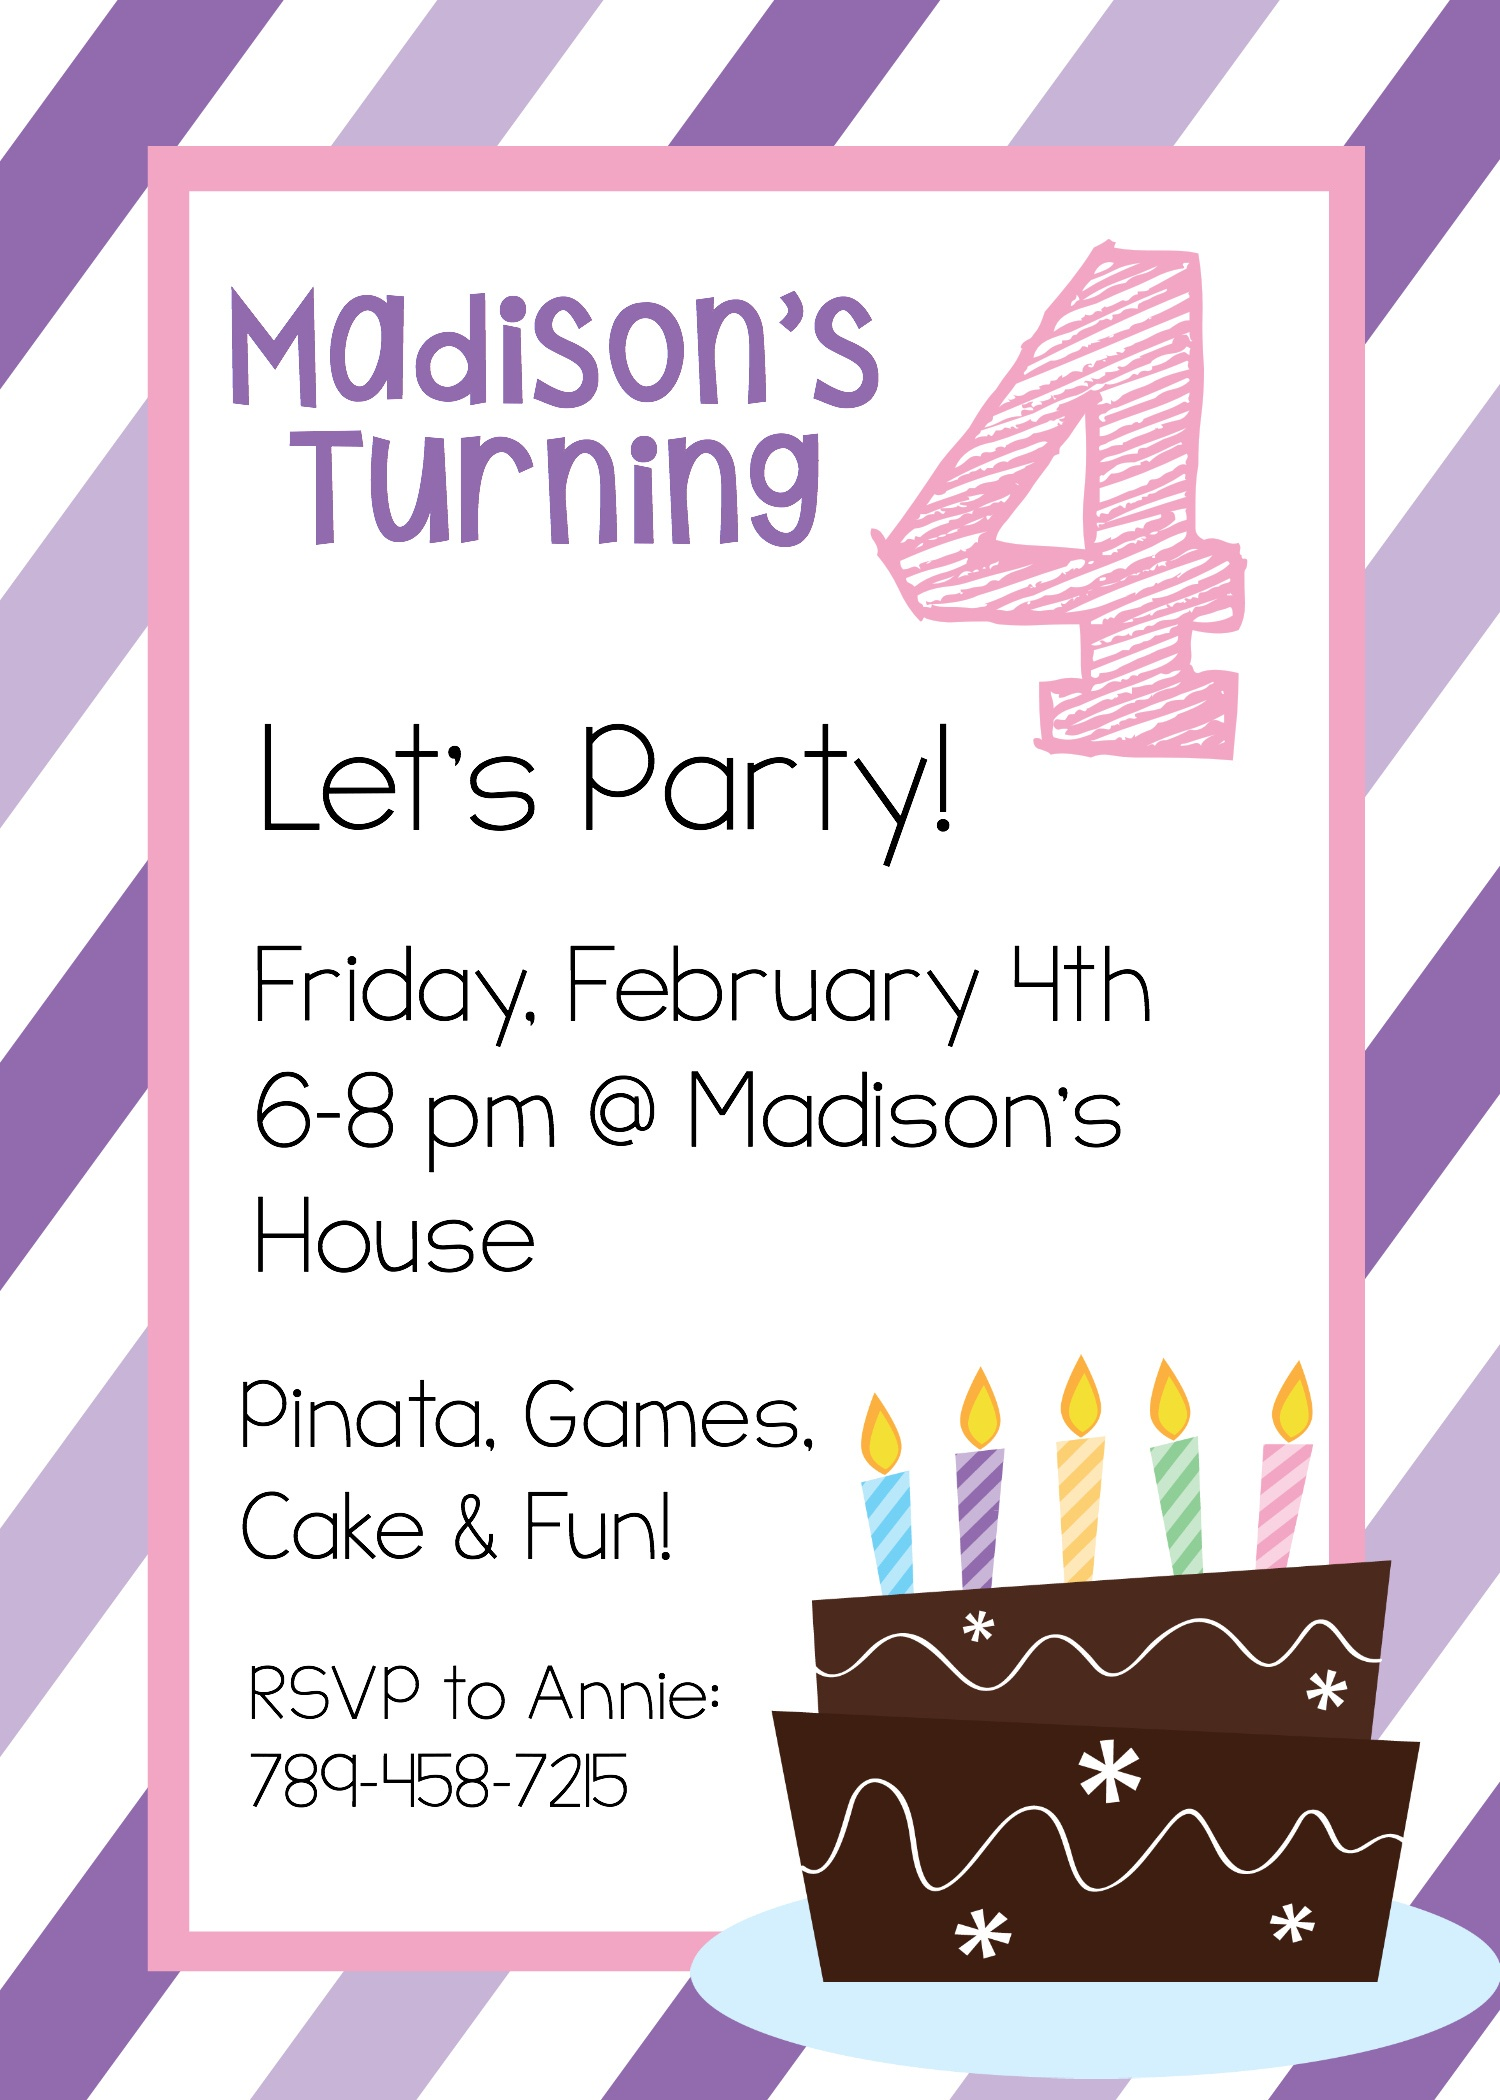 Make Printable Birthday Invitations - Demir.iso-Consulting.co - Make A Birthday Invitation Online Free Printable